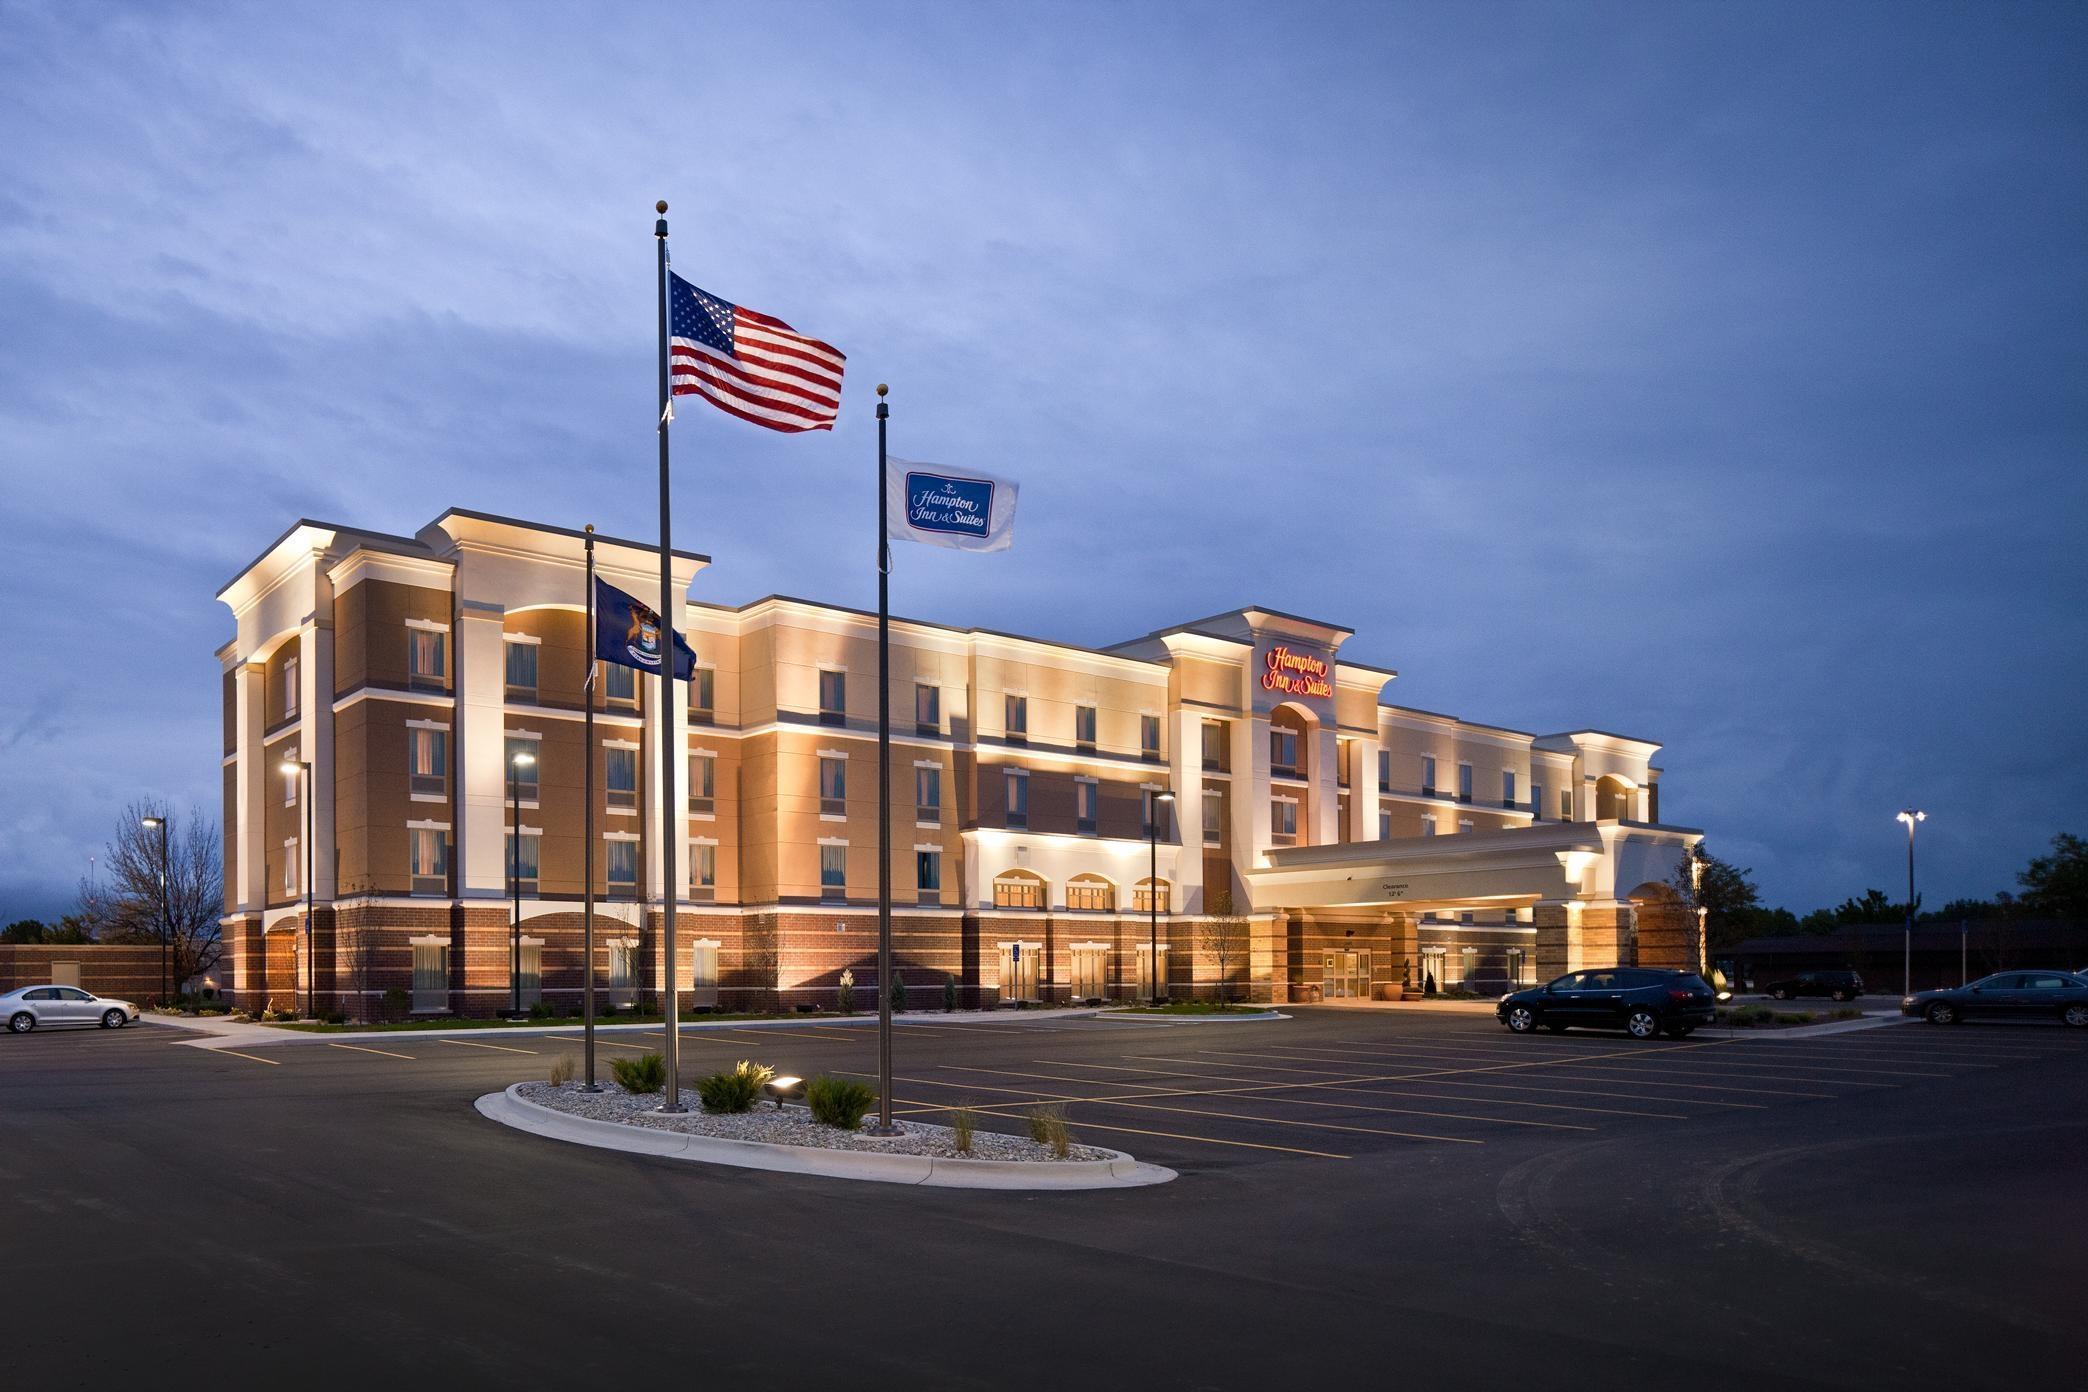 Hampton Inn & Suites Saginaw image 0